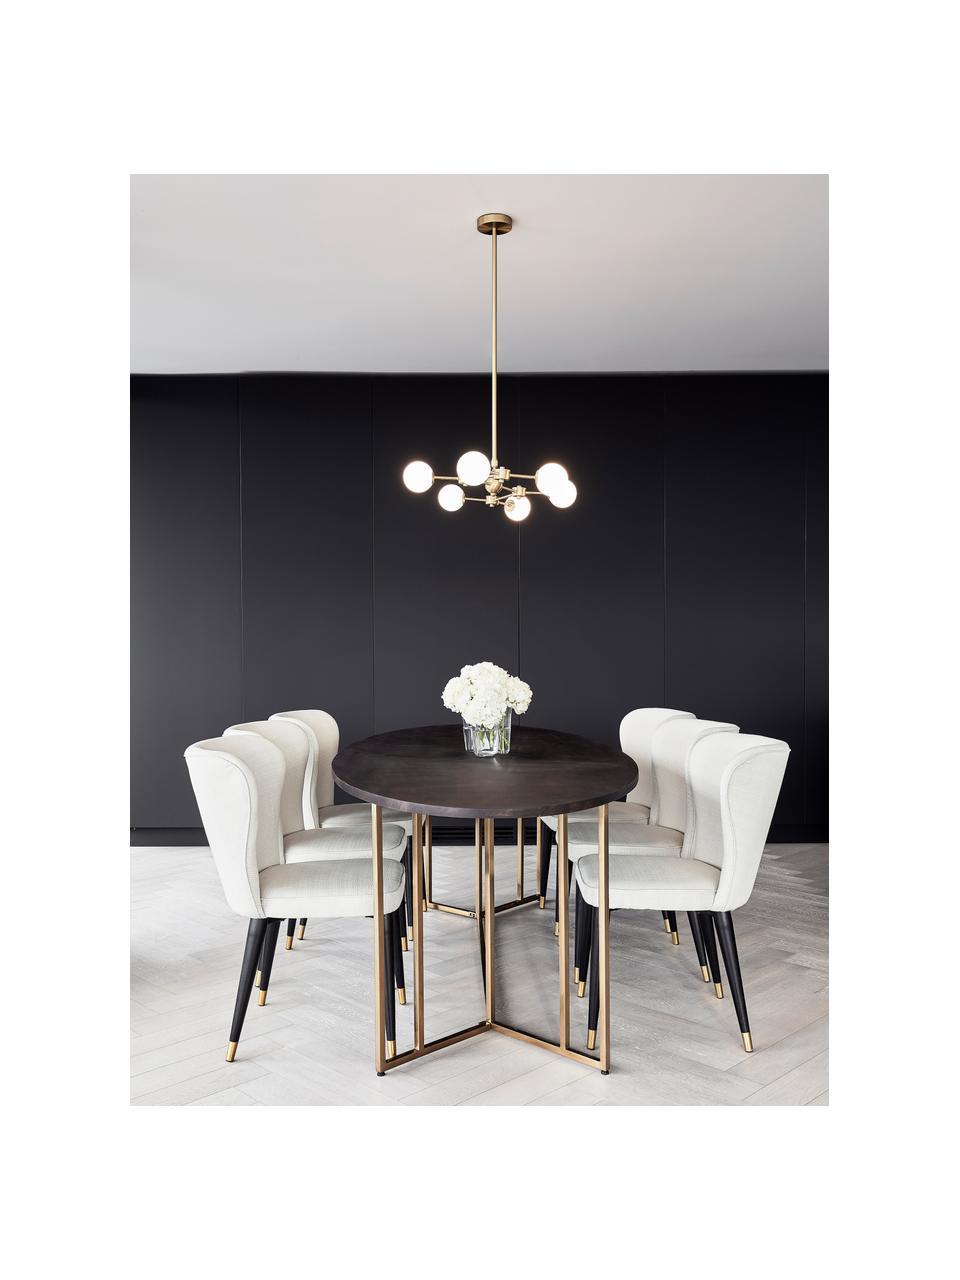 Ovaler Esstisch Luca mit Massivholzplatte, Tischplatte: Massives Mangoholz, gebür, Gestell: Metall, pulverbeschichtet, Braun, Goldfarben, B 180 x T 100 cm